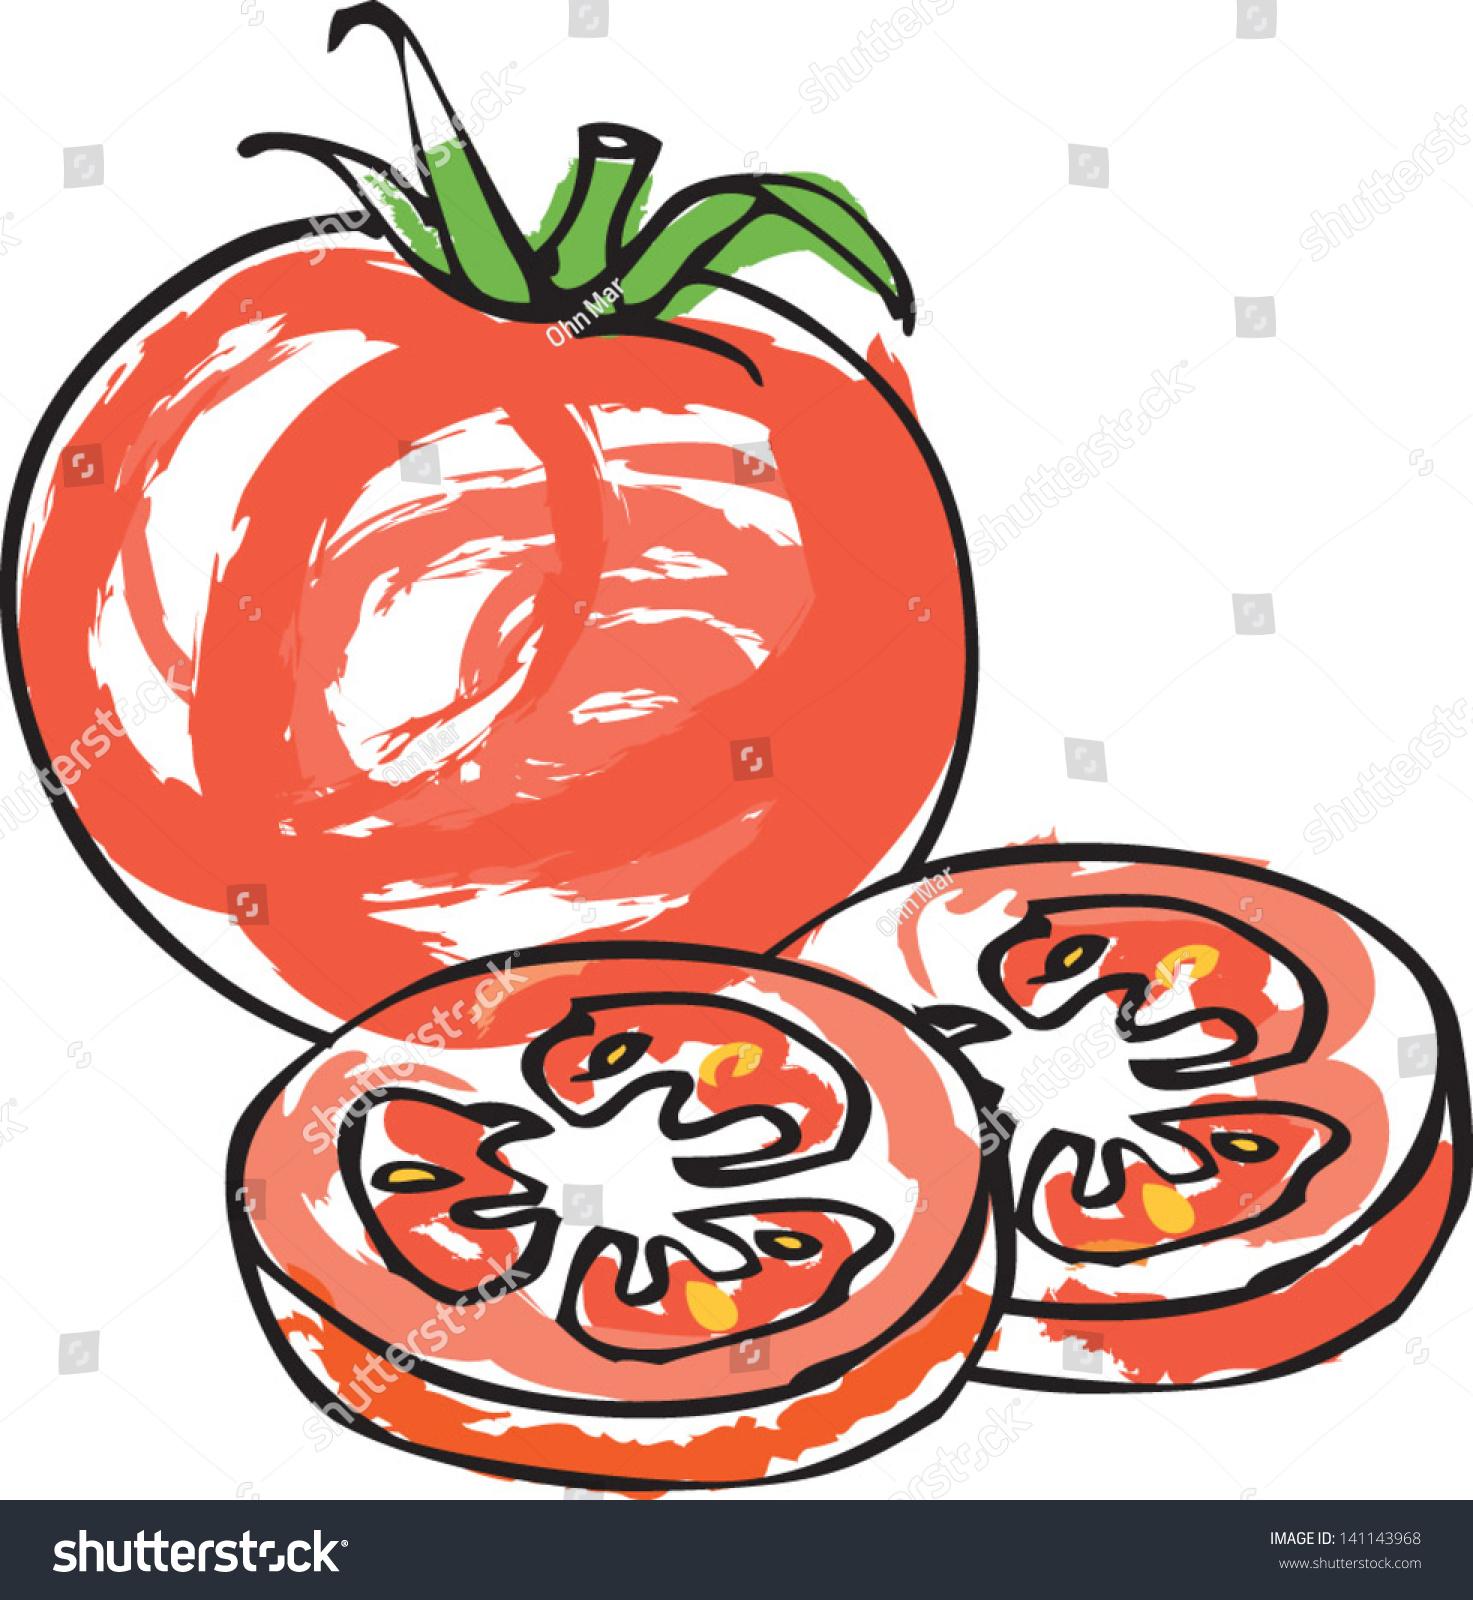 Fresh Tomato With Tomato Slices Stock Vector Illustration ...